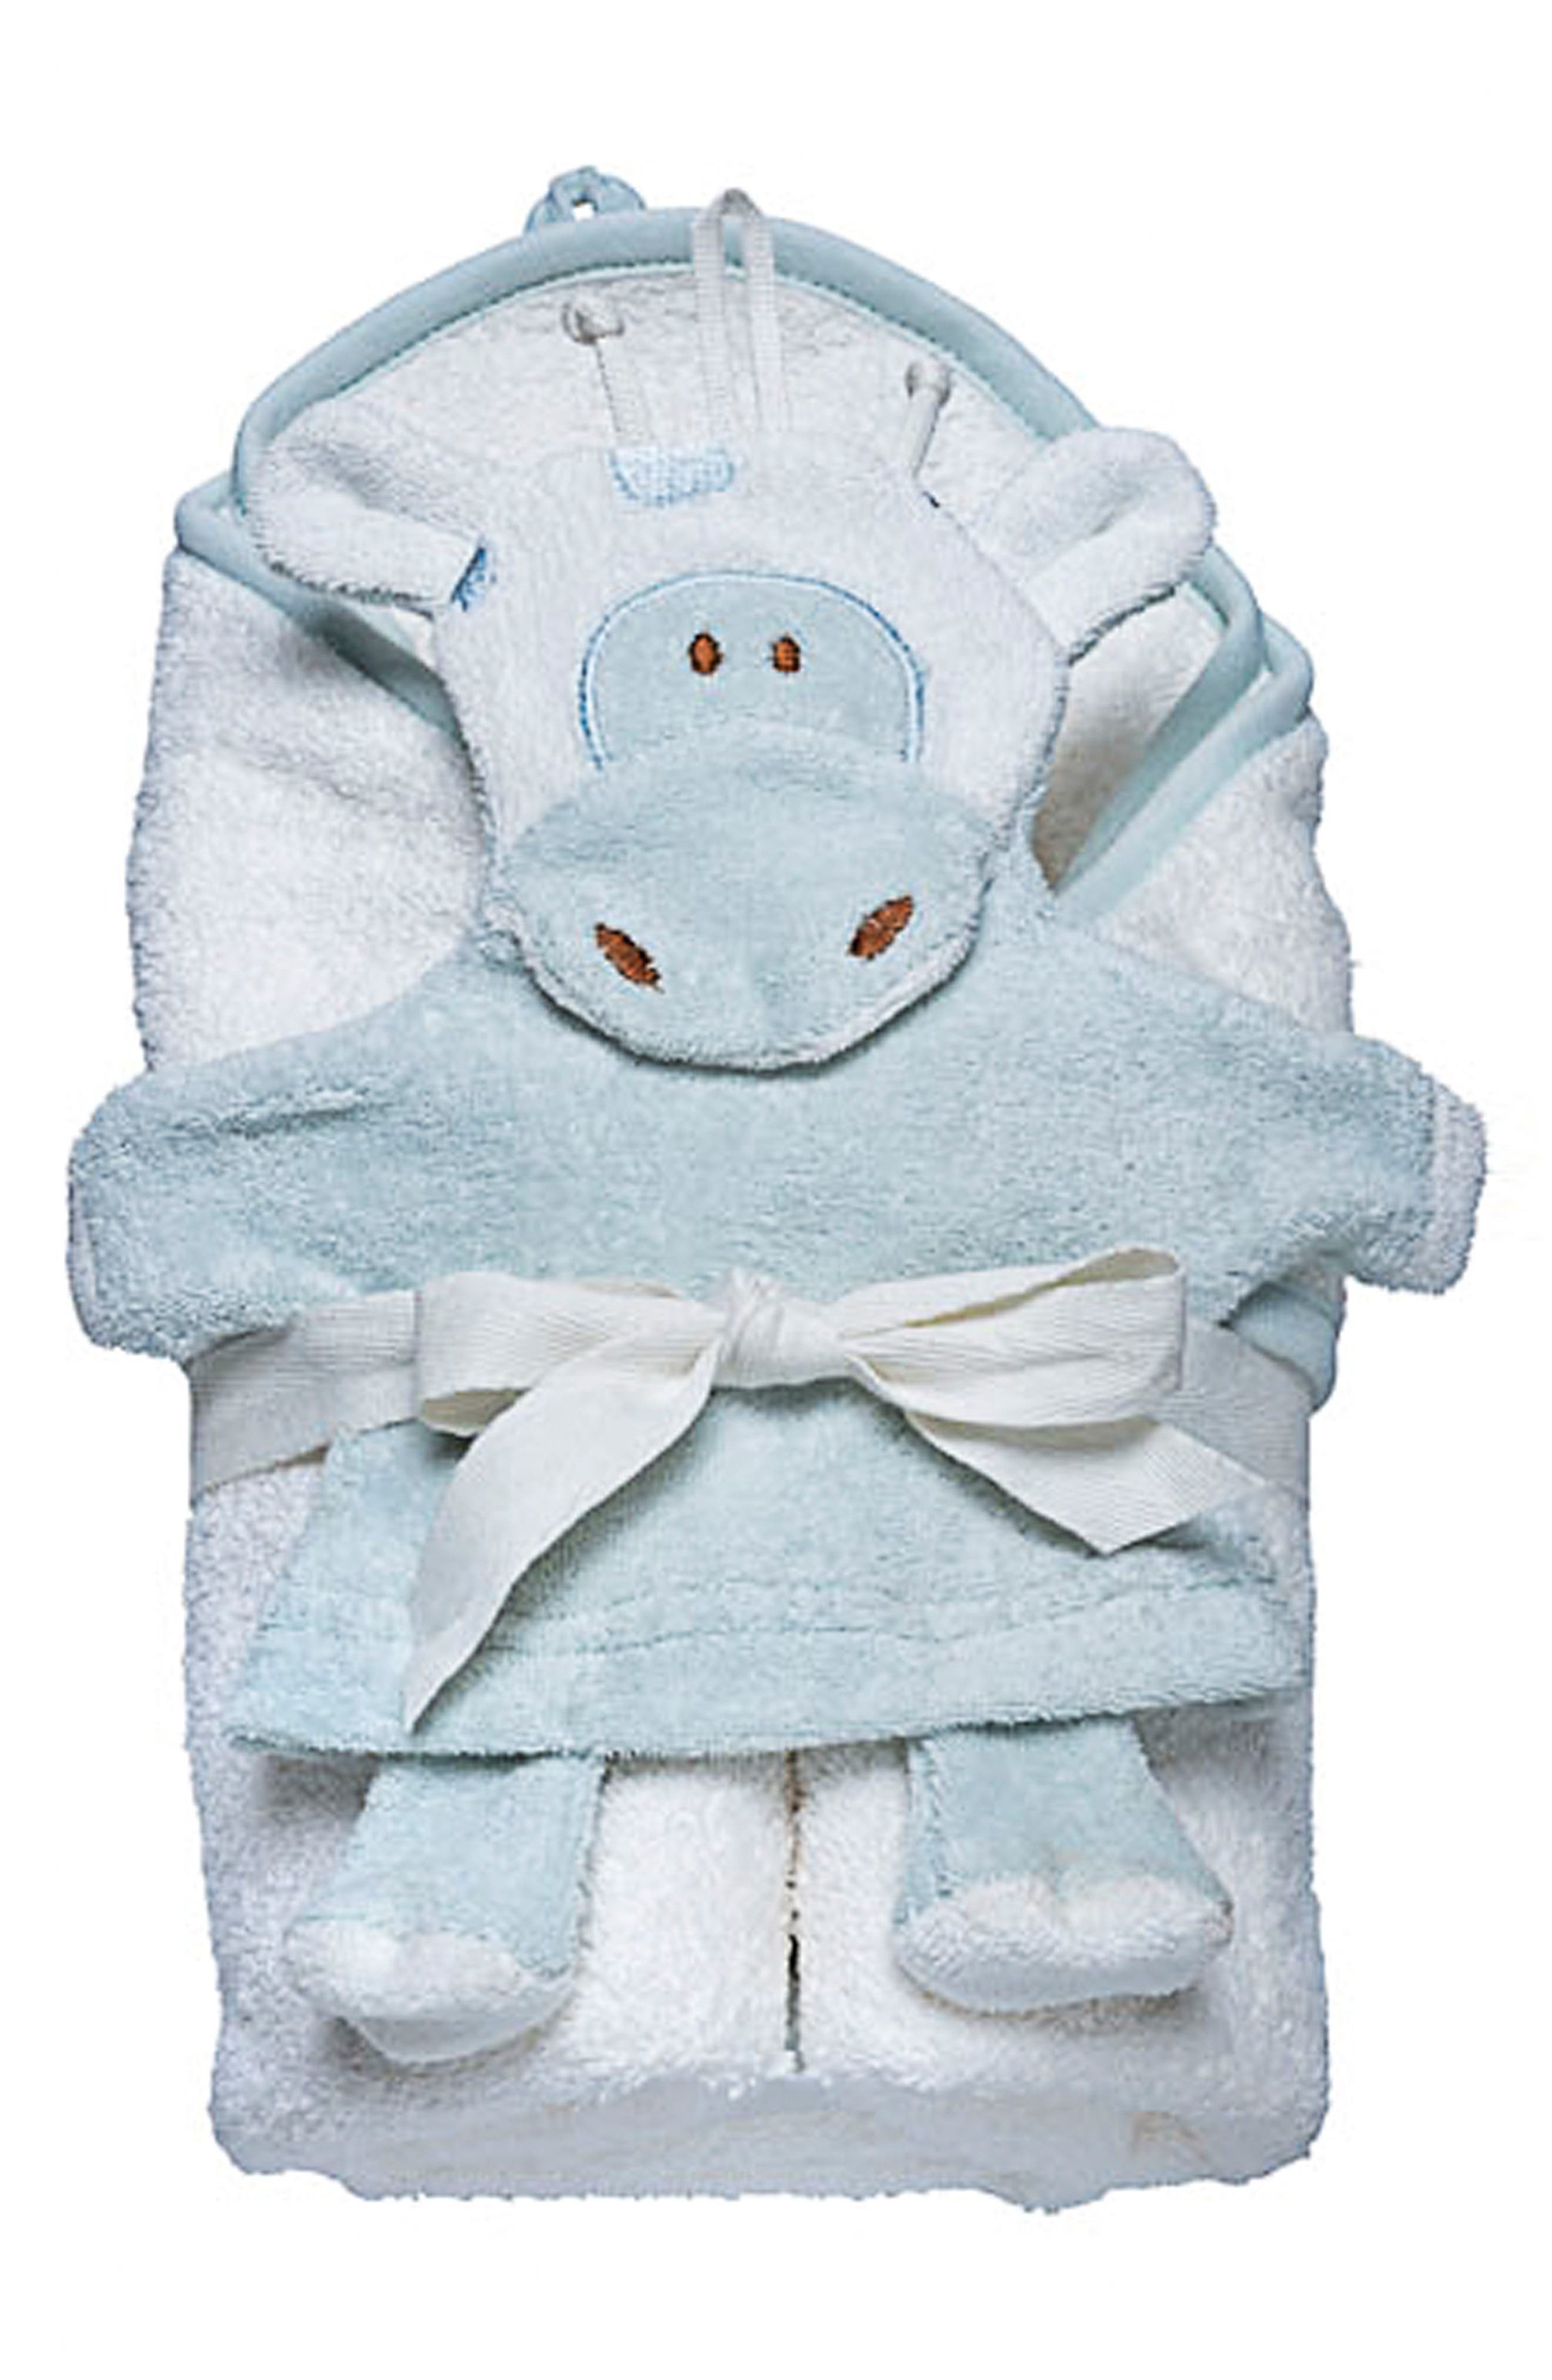 Under the Nile Hooded Towel & Bath Mitt Set